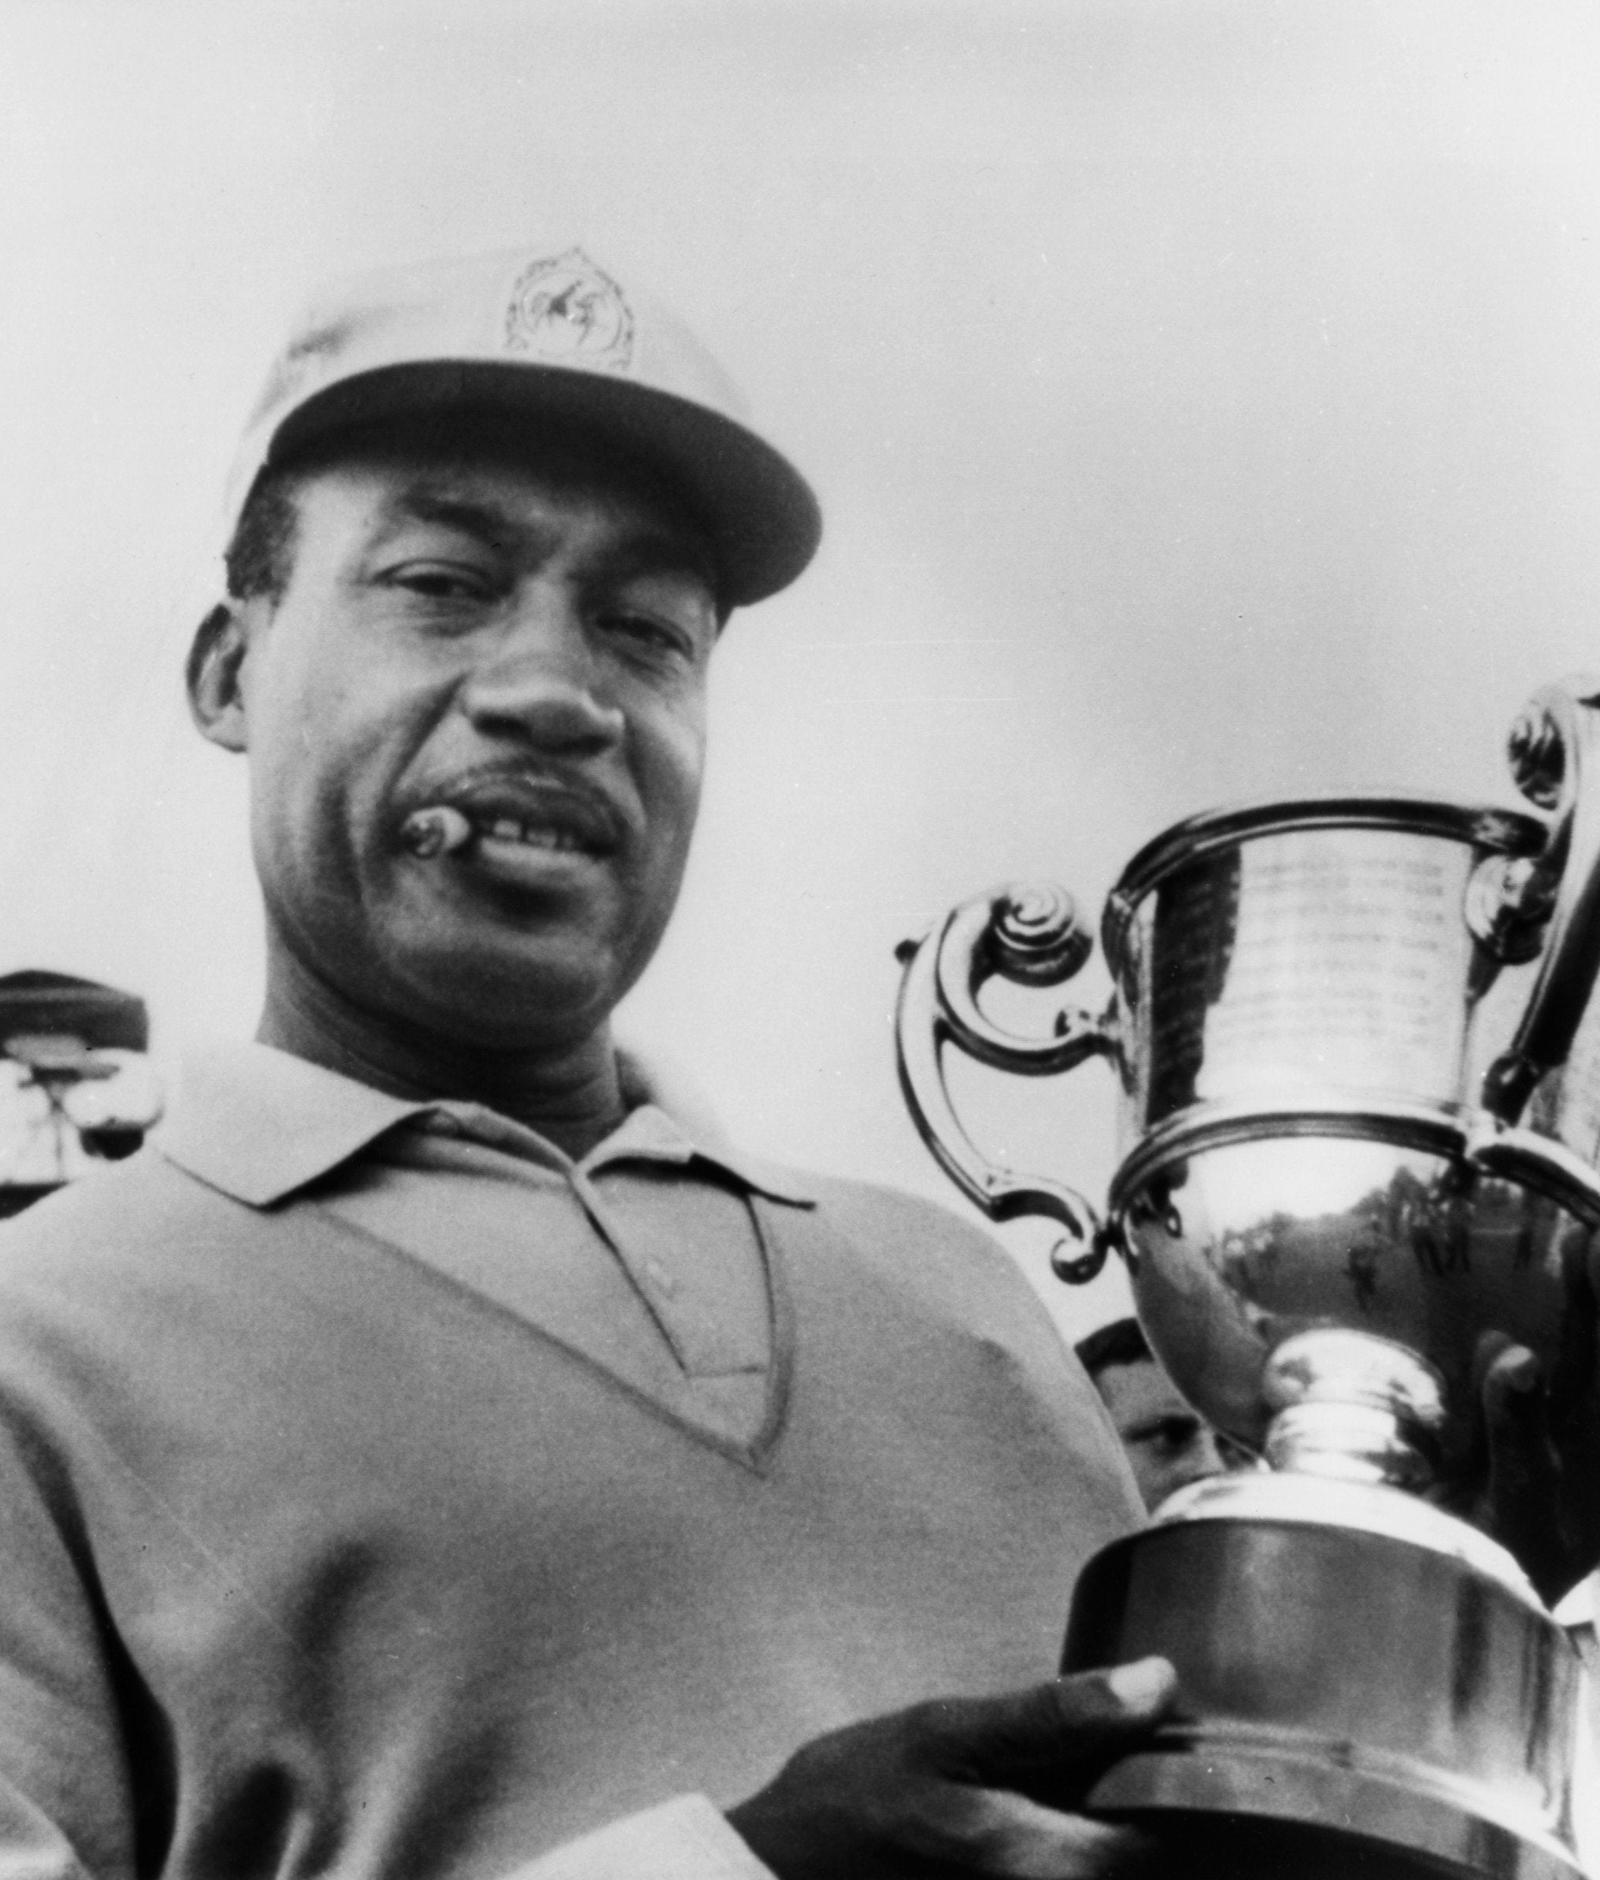 Golf champion Charlie Sifford